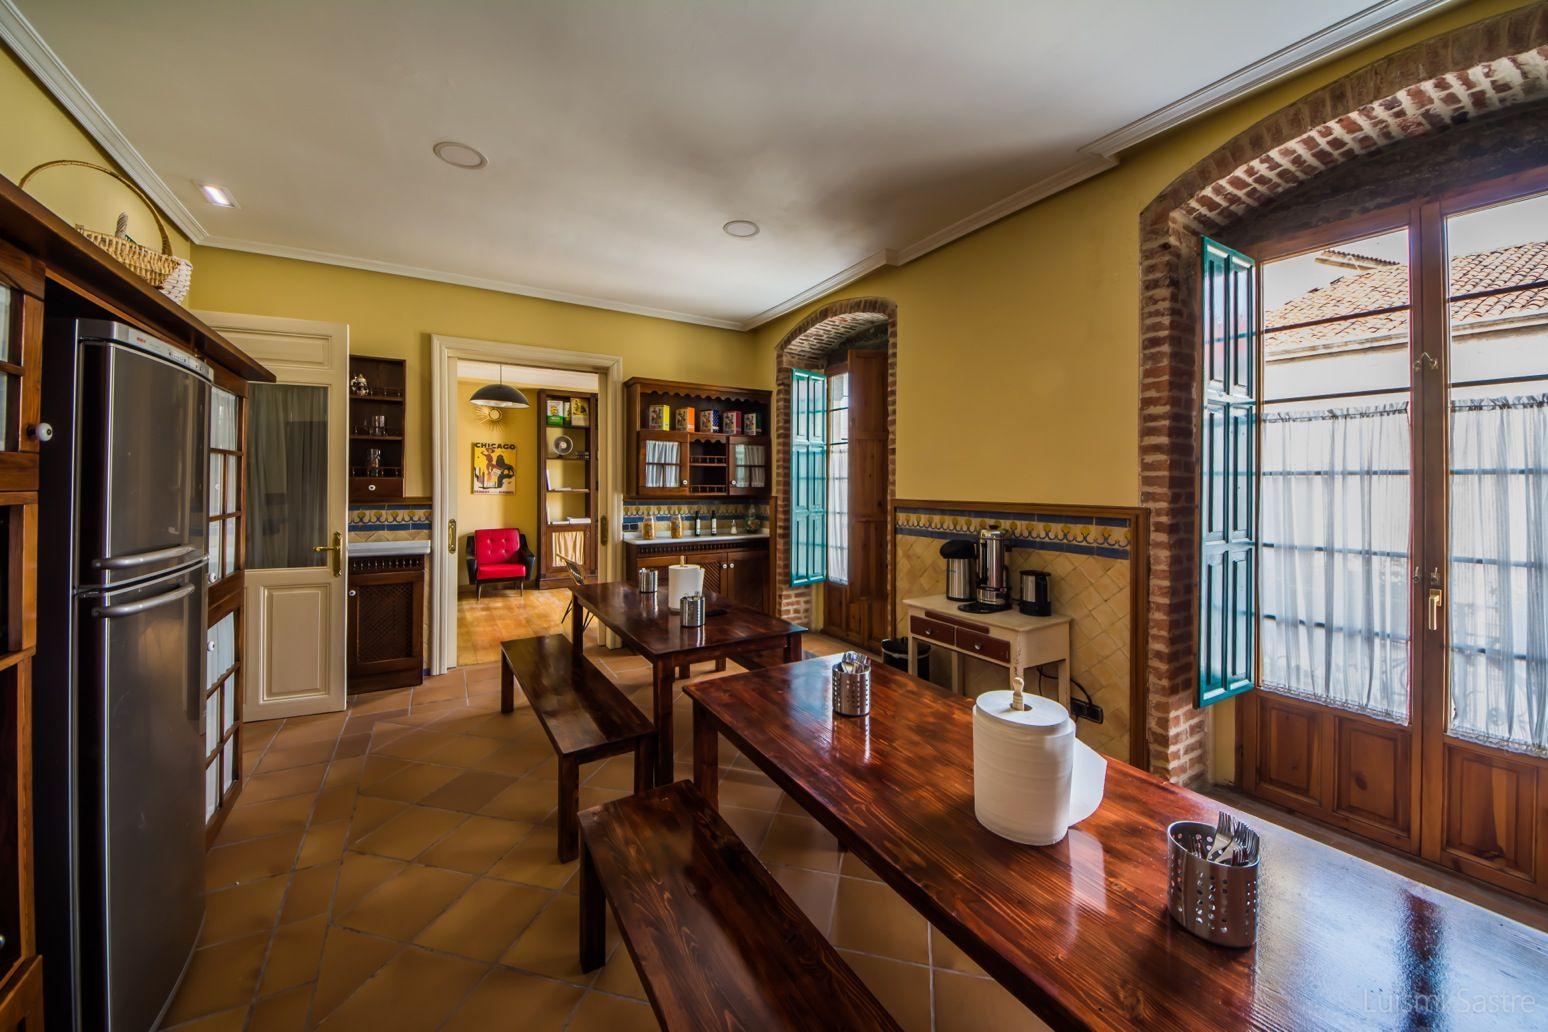 Alojamiento con cocina equipada en León